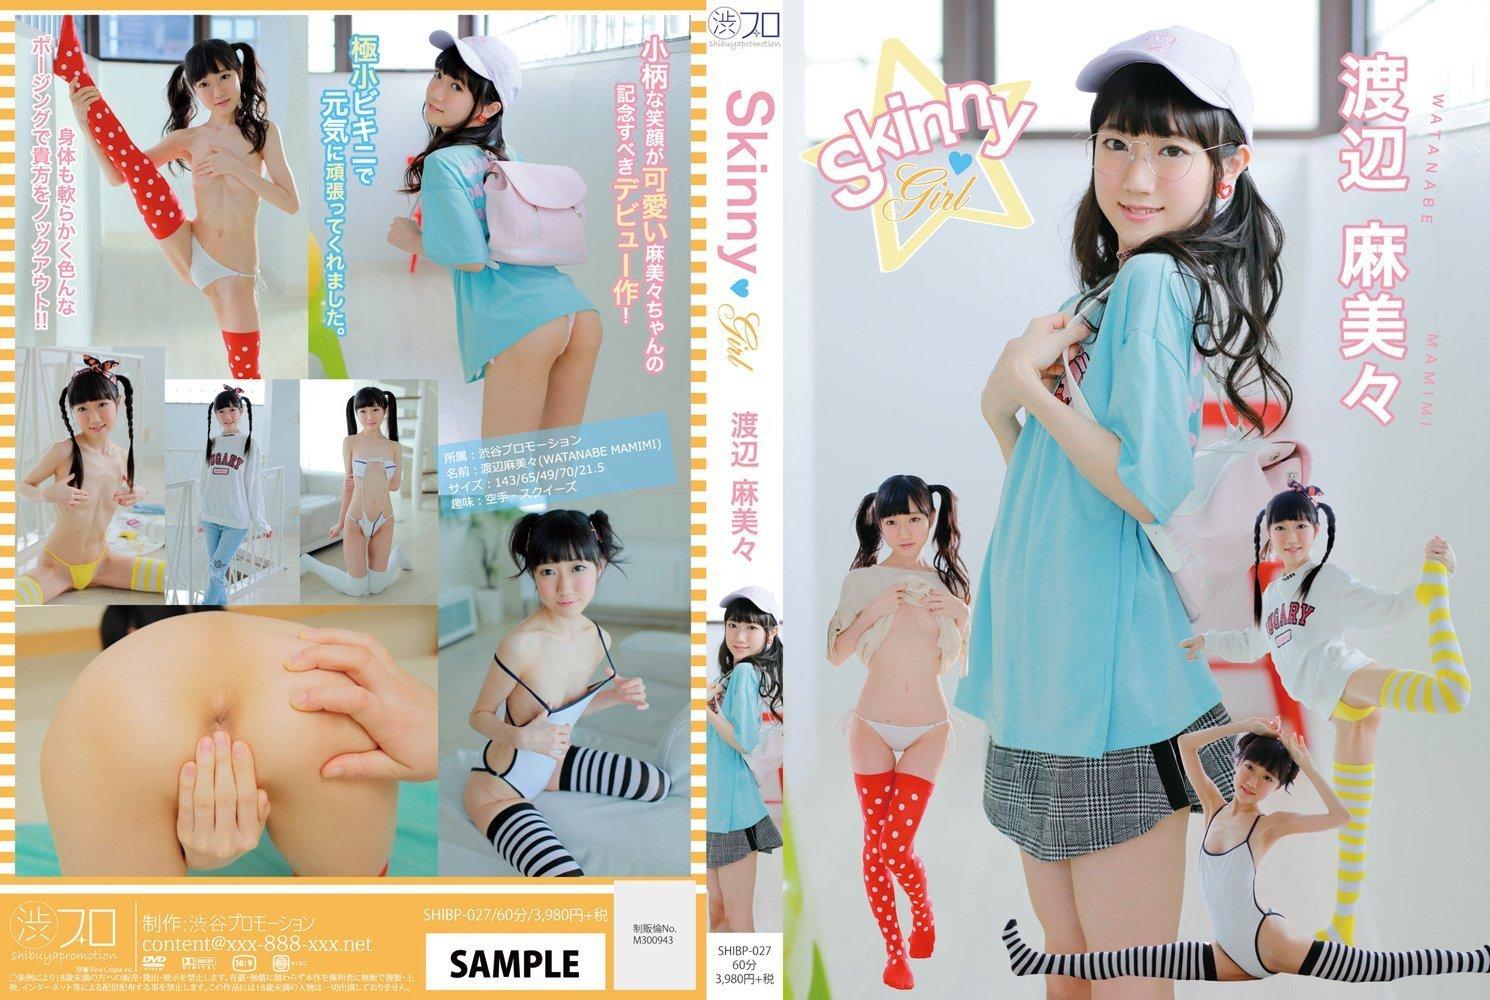 Mamimi Watanabe - Skinny Girl